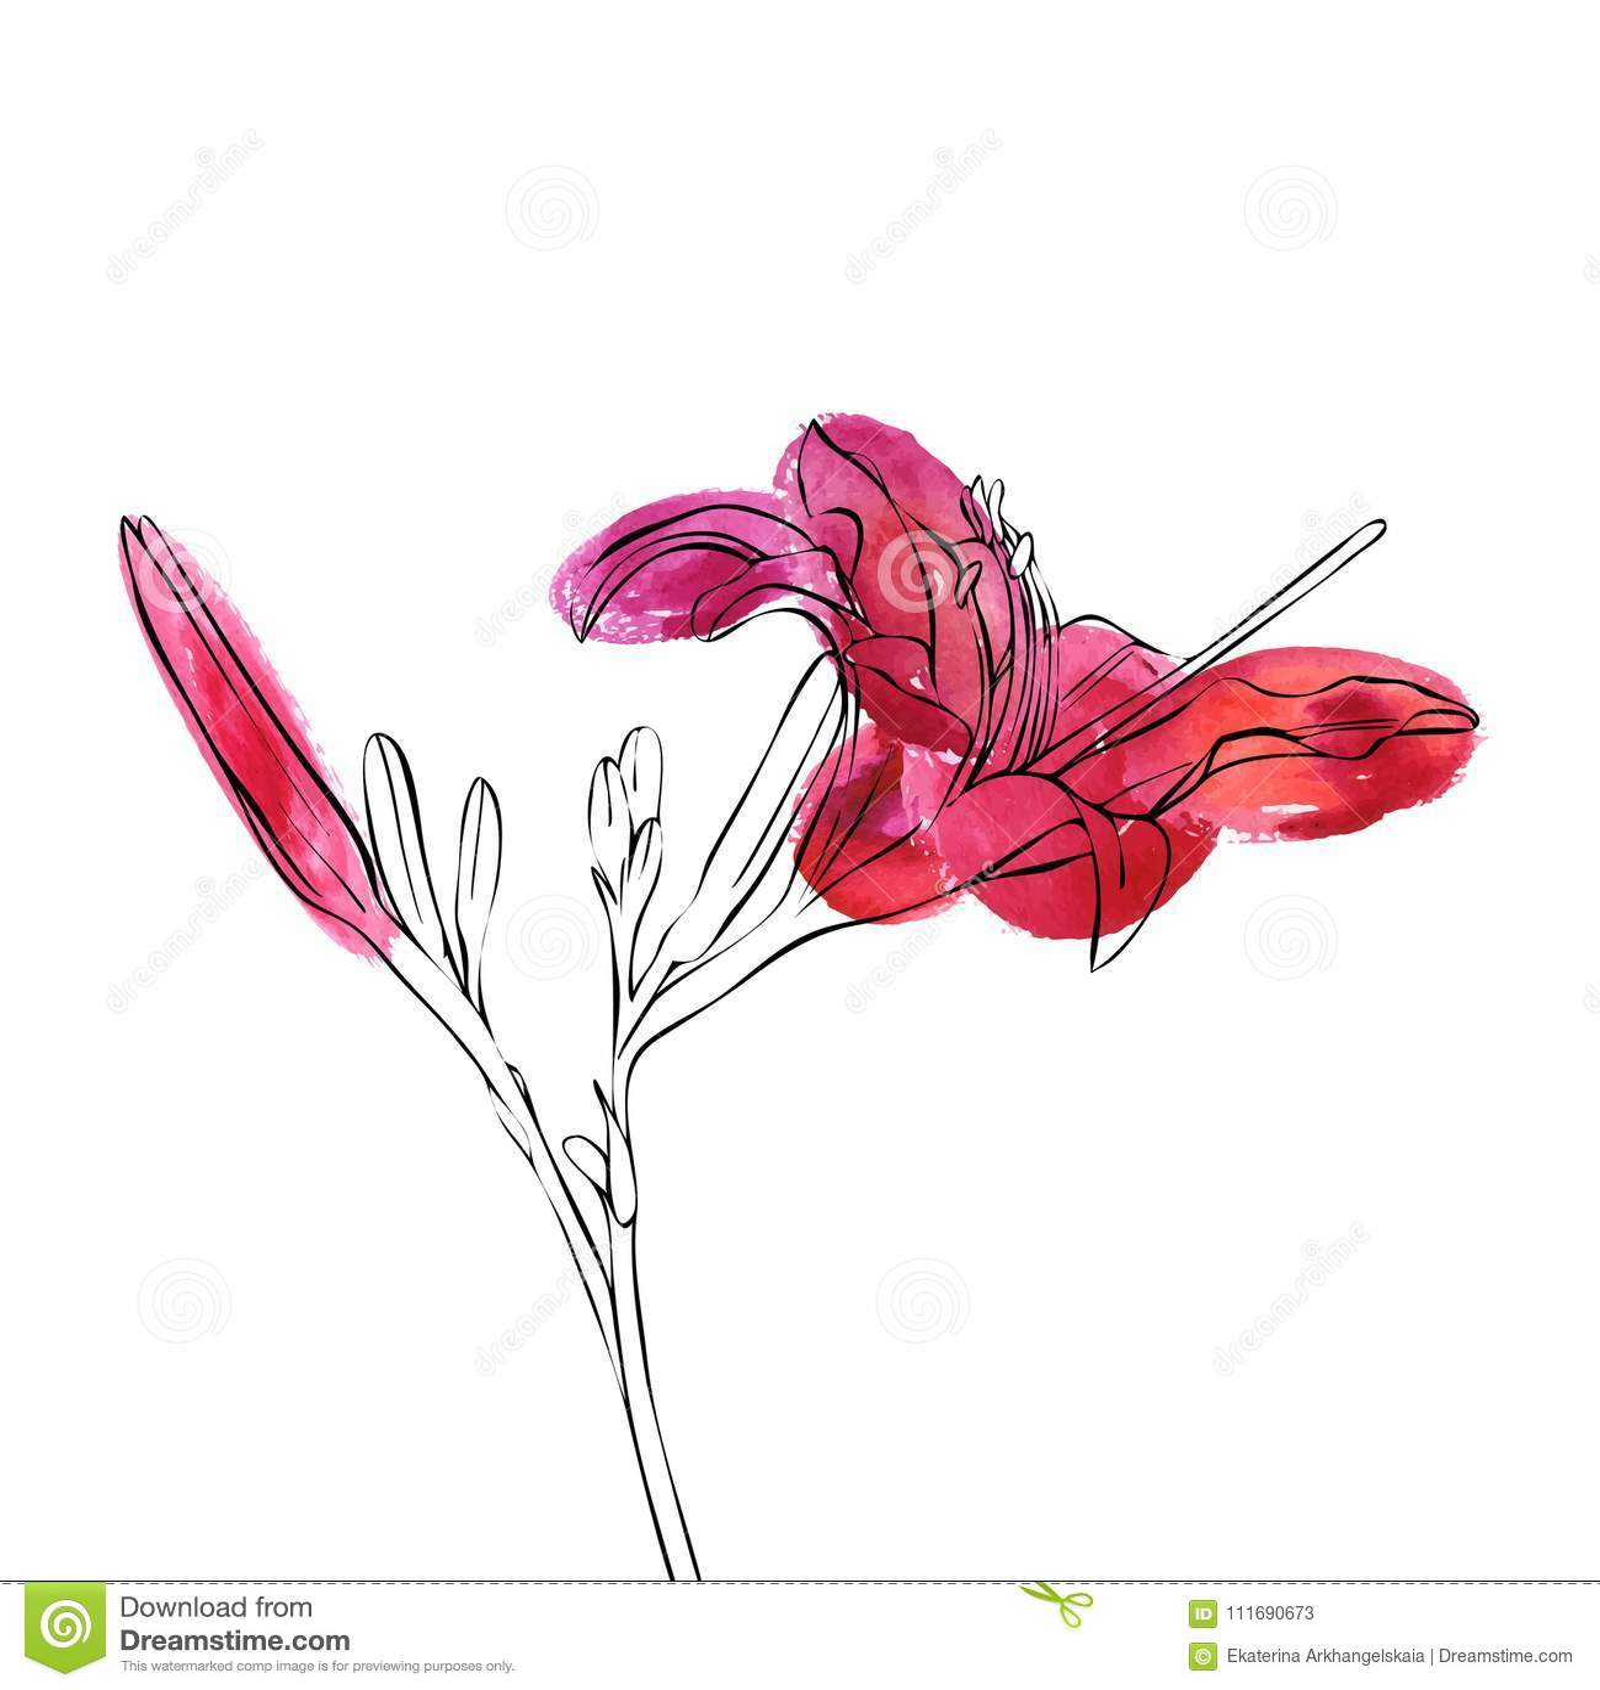 Vector drawing flower of lily stock vector illustration of drawing download vector drawing flower of lily stock vector illustration of drawing line 111690673 izmirmasajfo